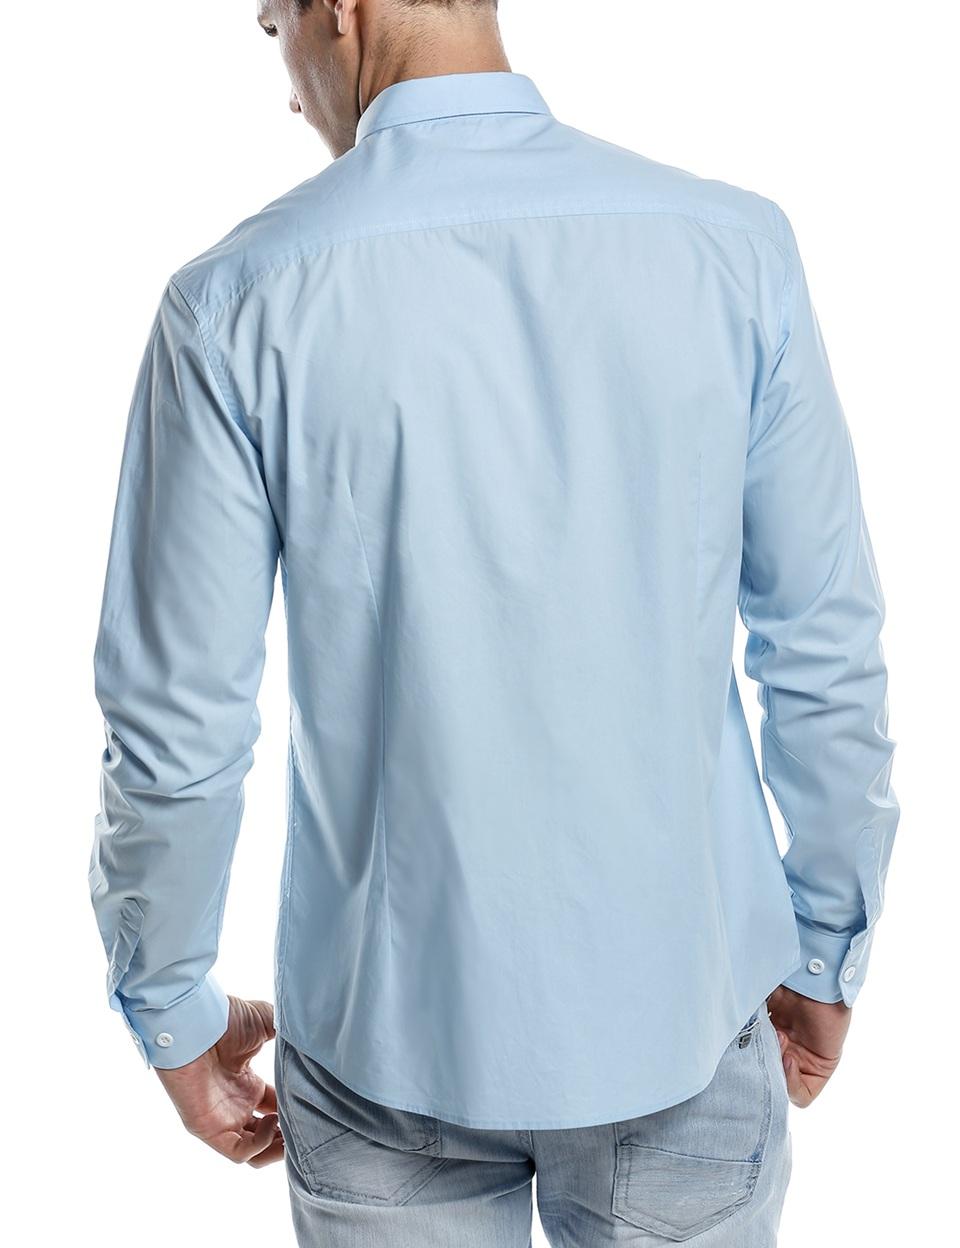 shirt (20)